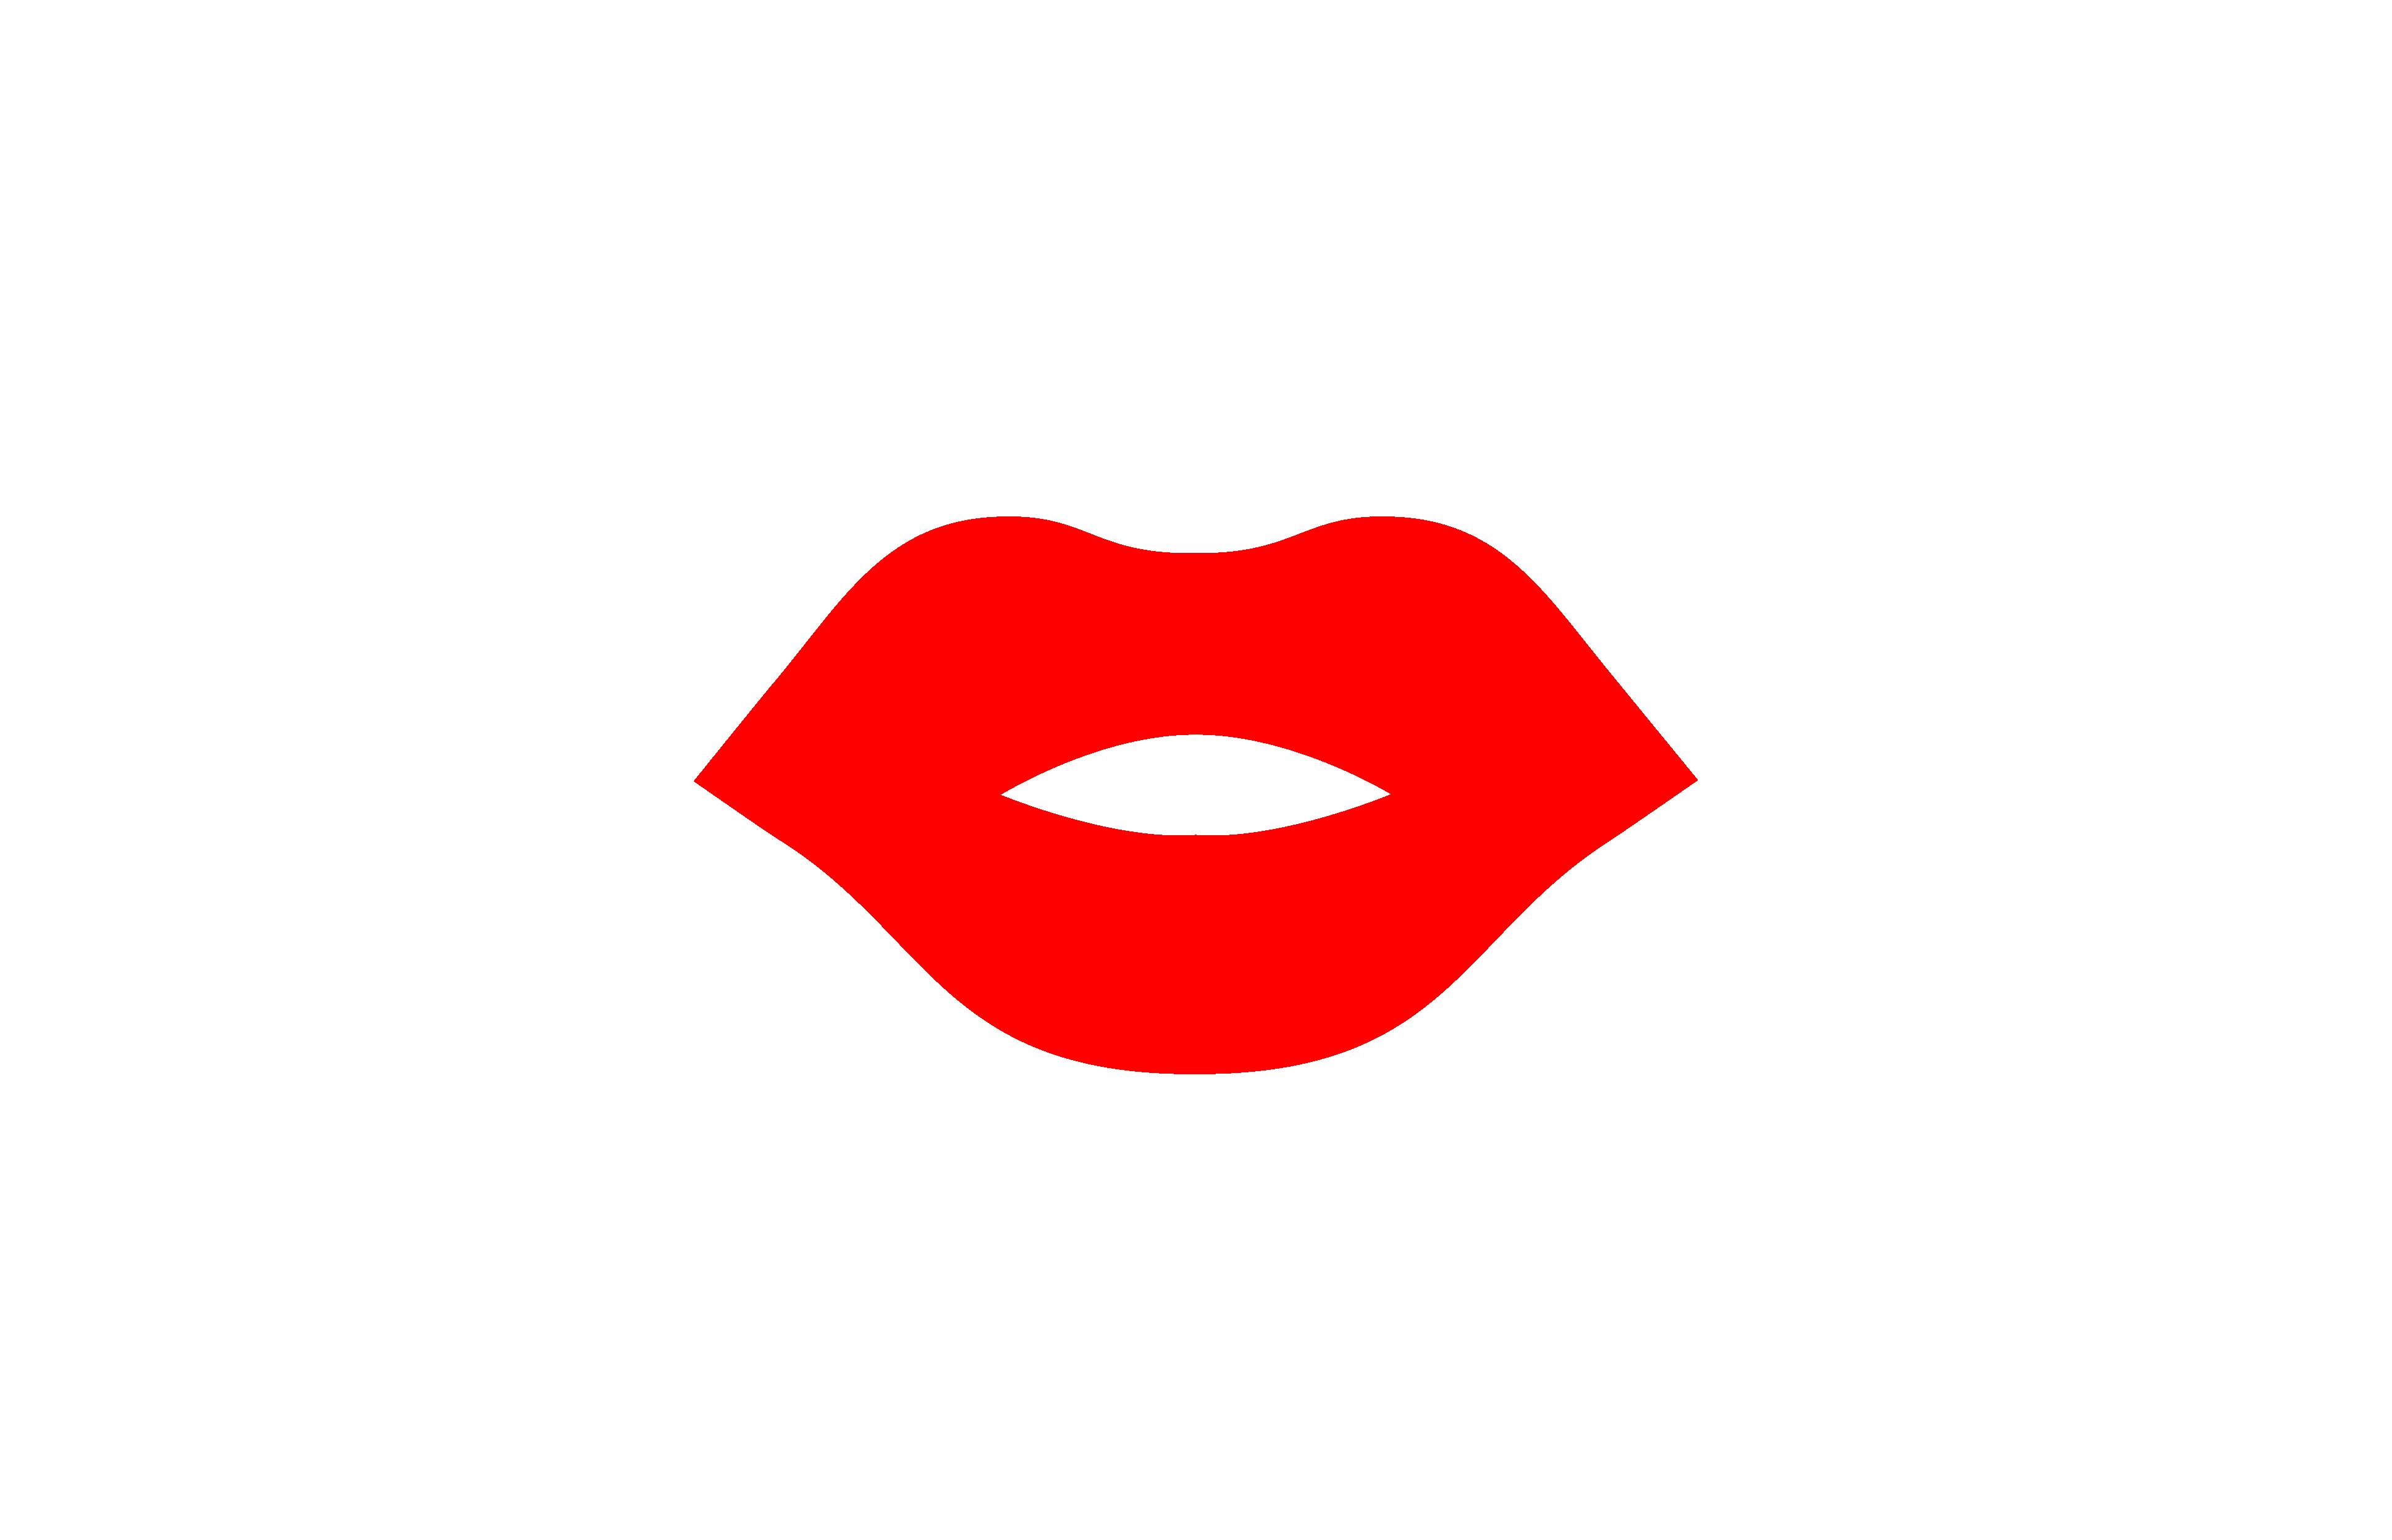 Melanin monroe